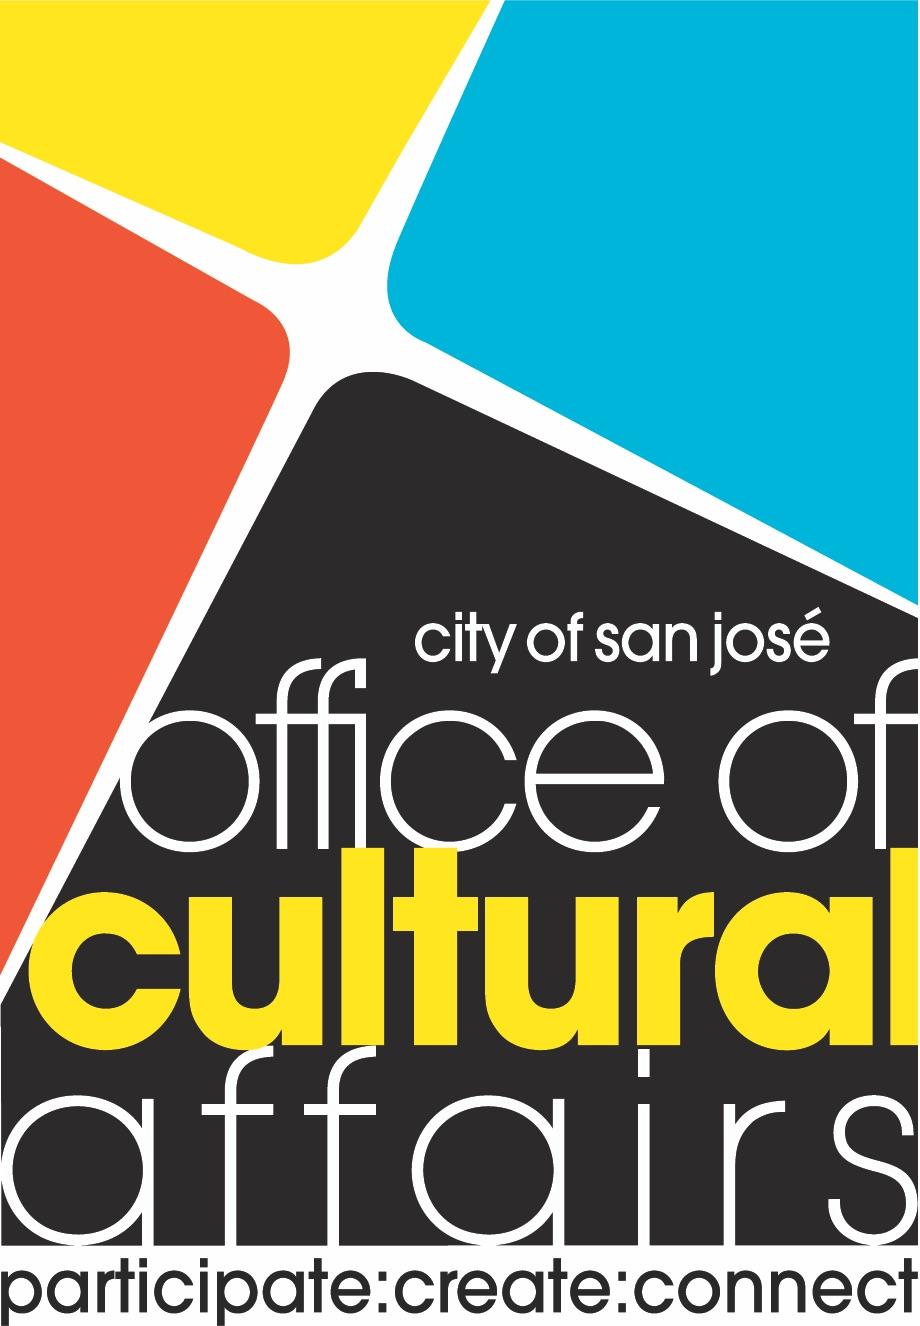 City of San José Office of Cultural Affairs logo